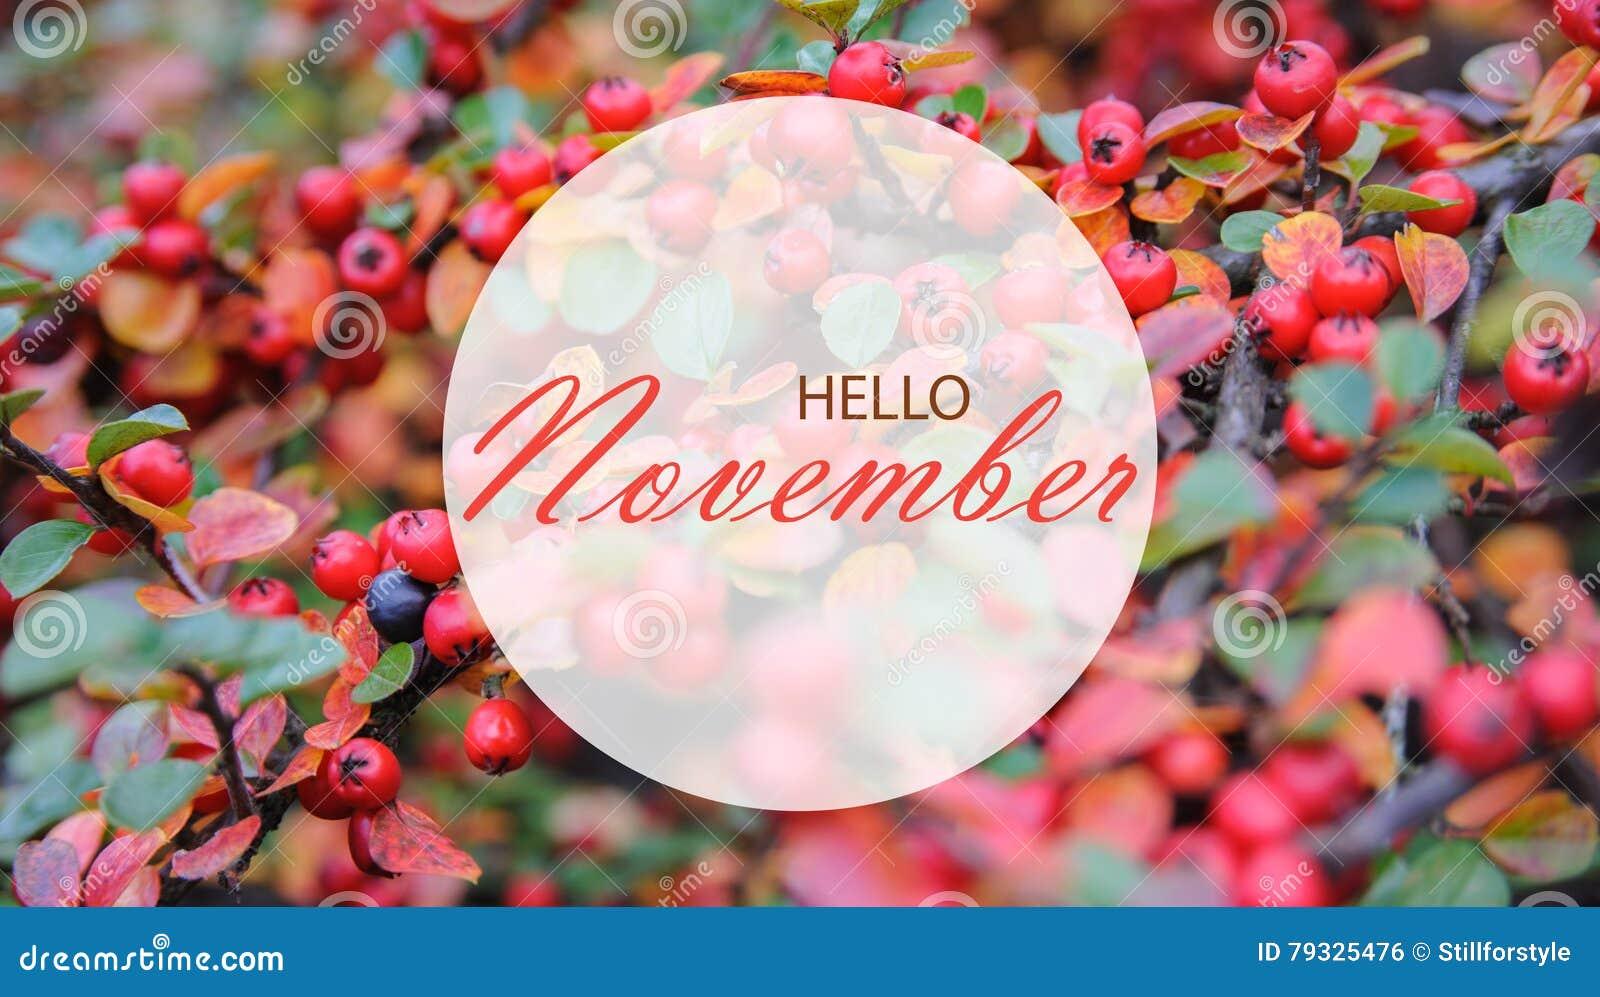 Hello November Wallpaper Stock Photo Image Of Autumn 79325476